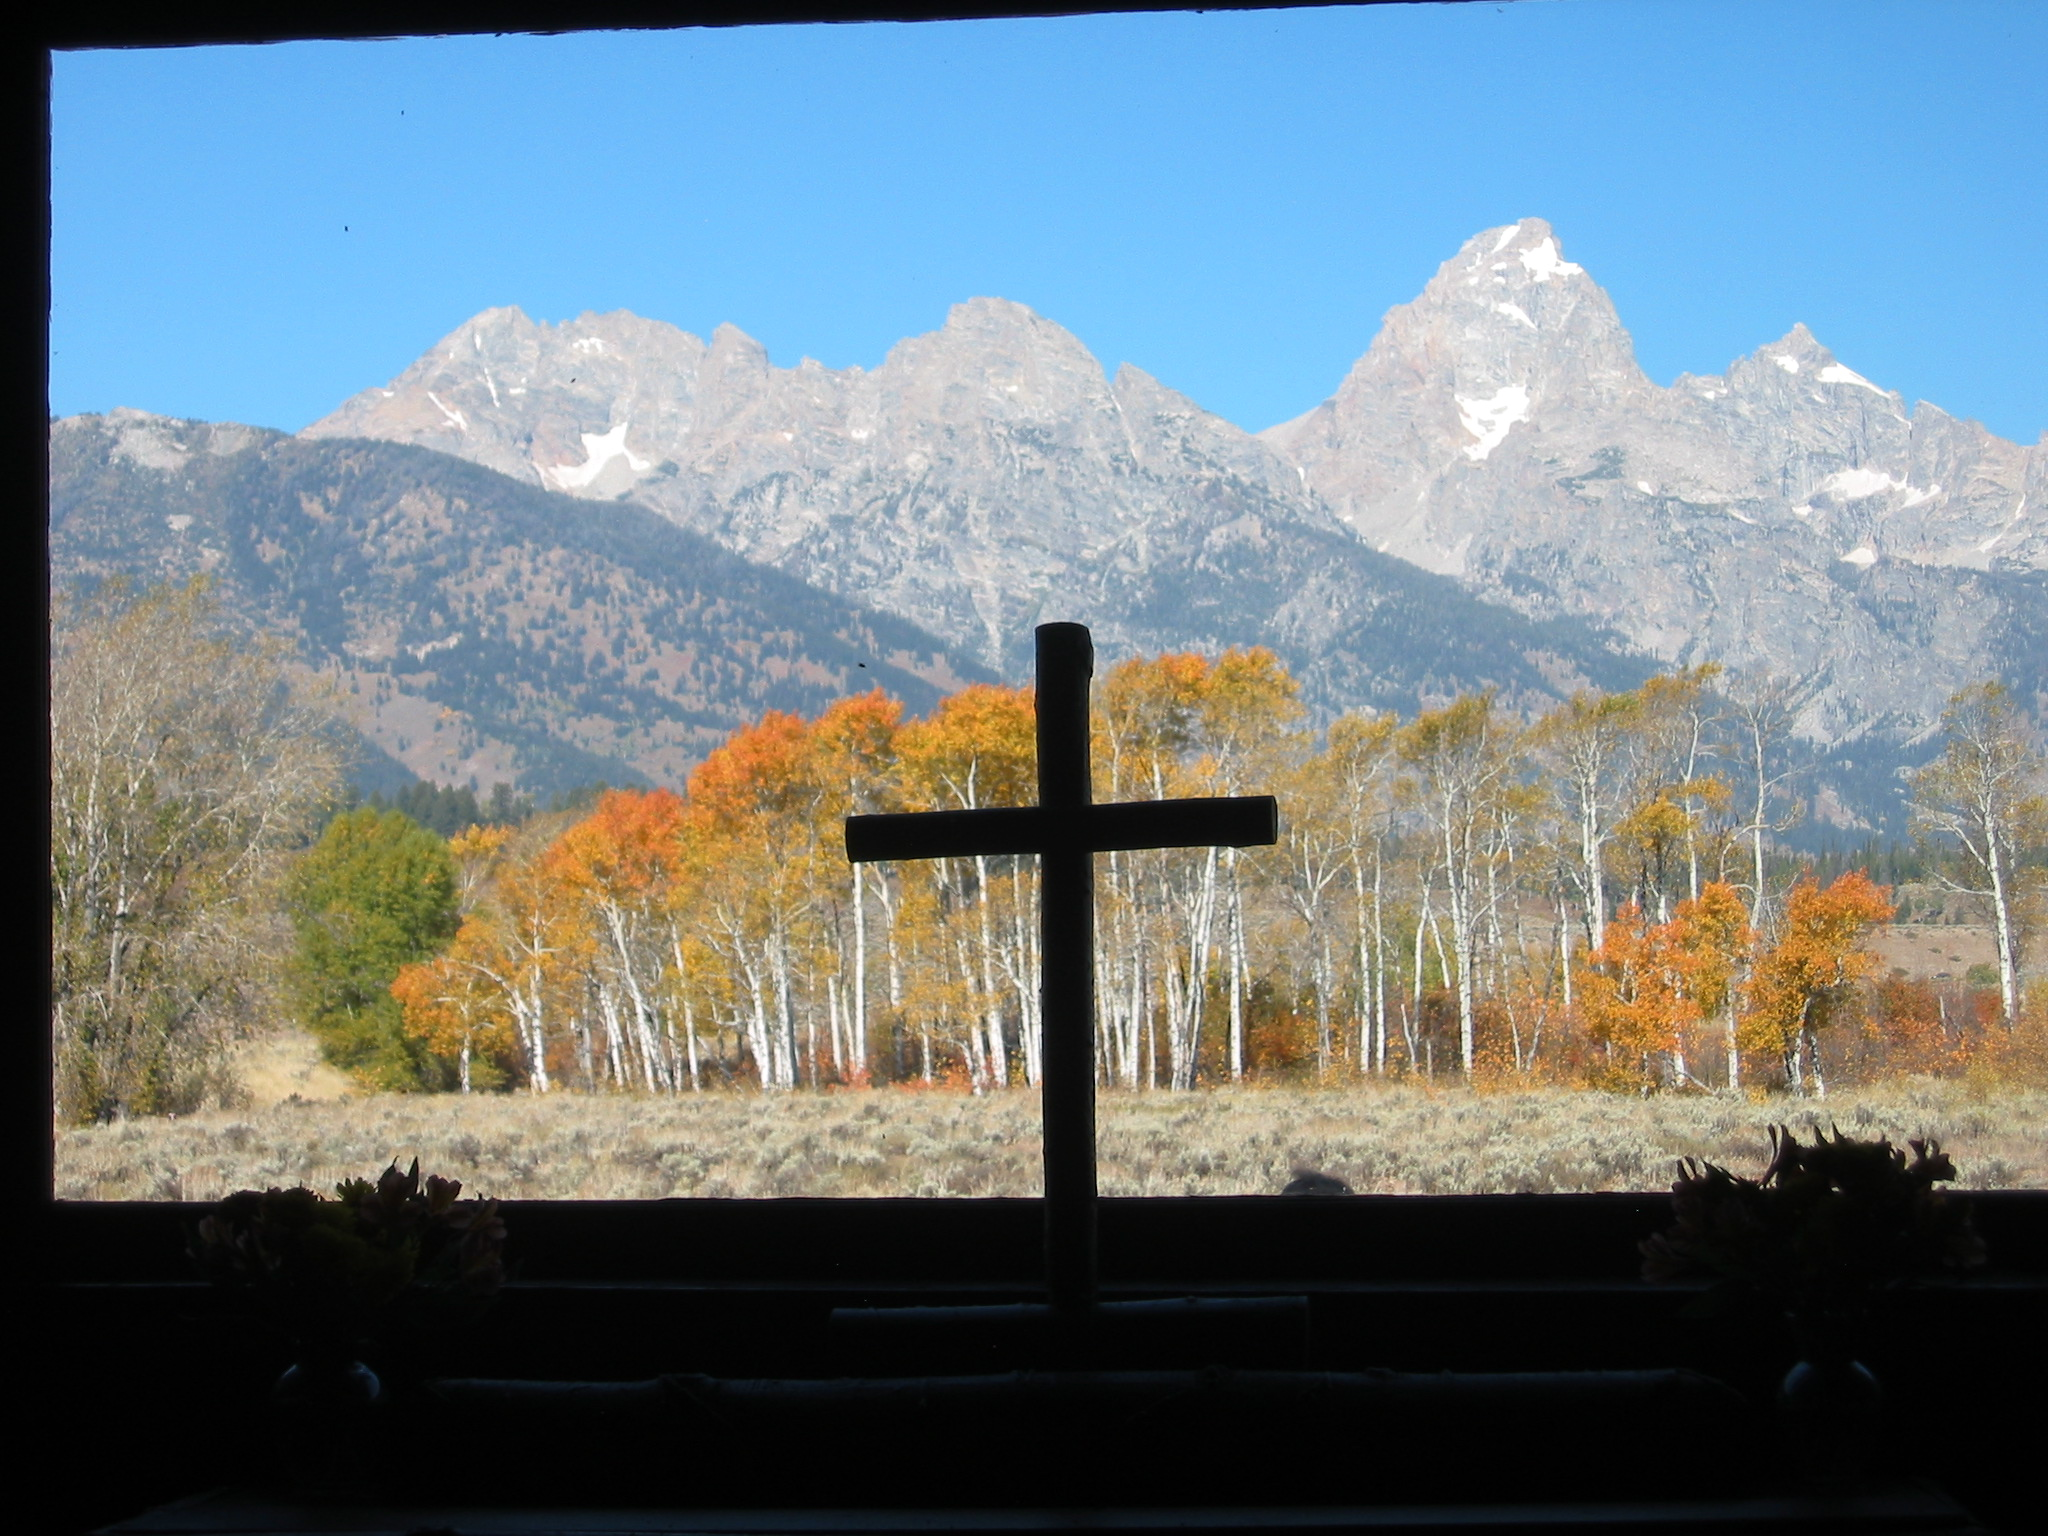 Grand Tetons Jackson Hole Wyoming And Salt Lake City